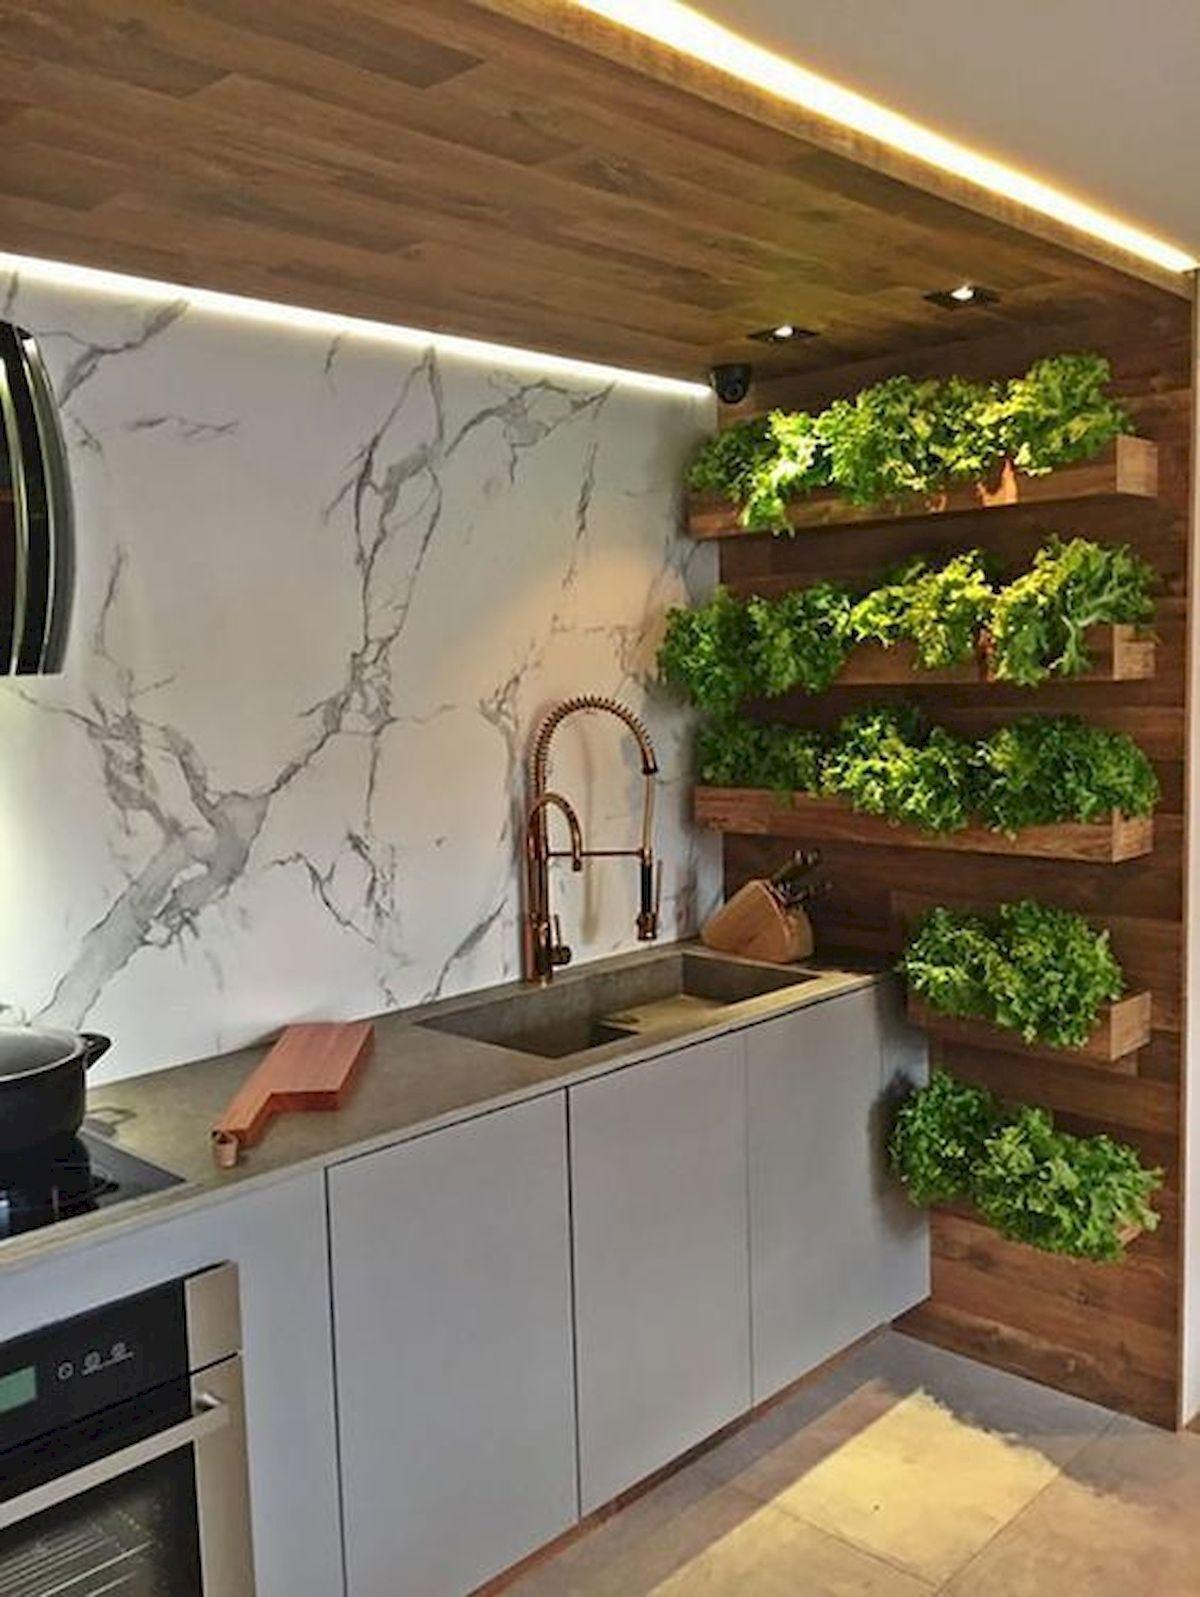 9 Vegetable Garden Small Spaces Design Ideas For Beginner ...